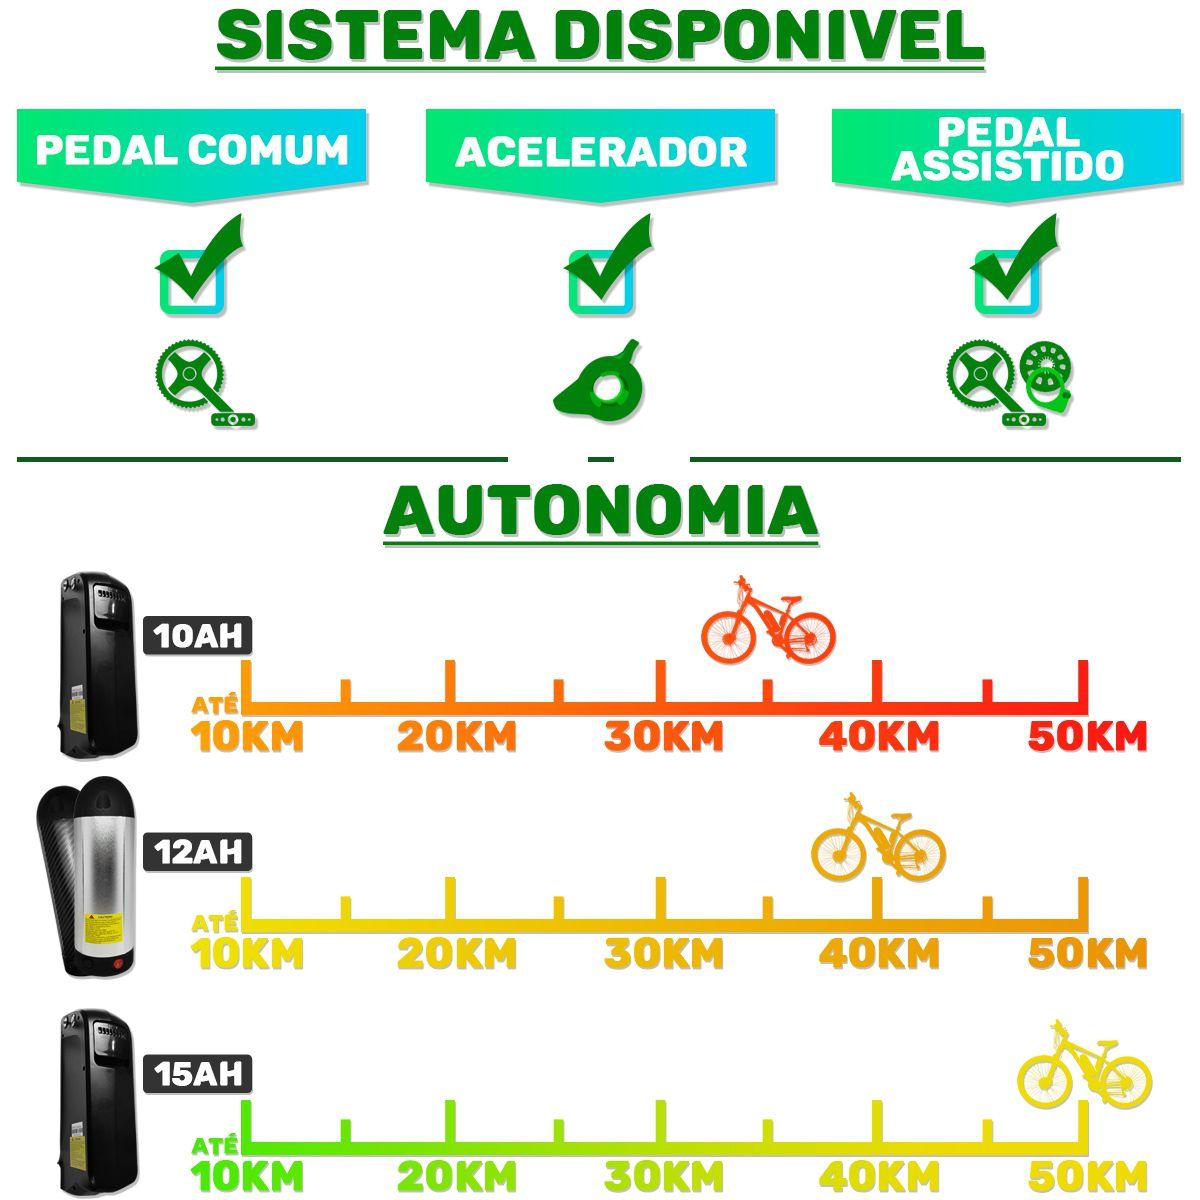 Bicicleta Elétrica Feminina Aro 29 Alumínio Bateria de Lítio TecFashion 2.0